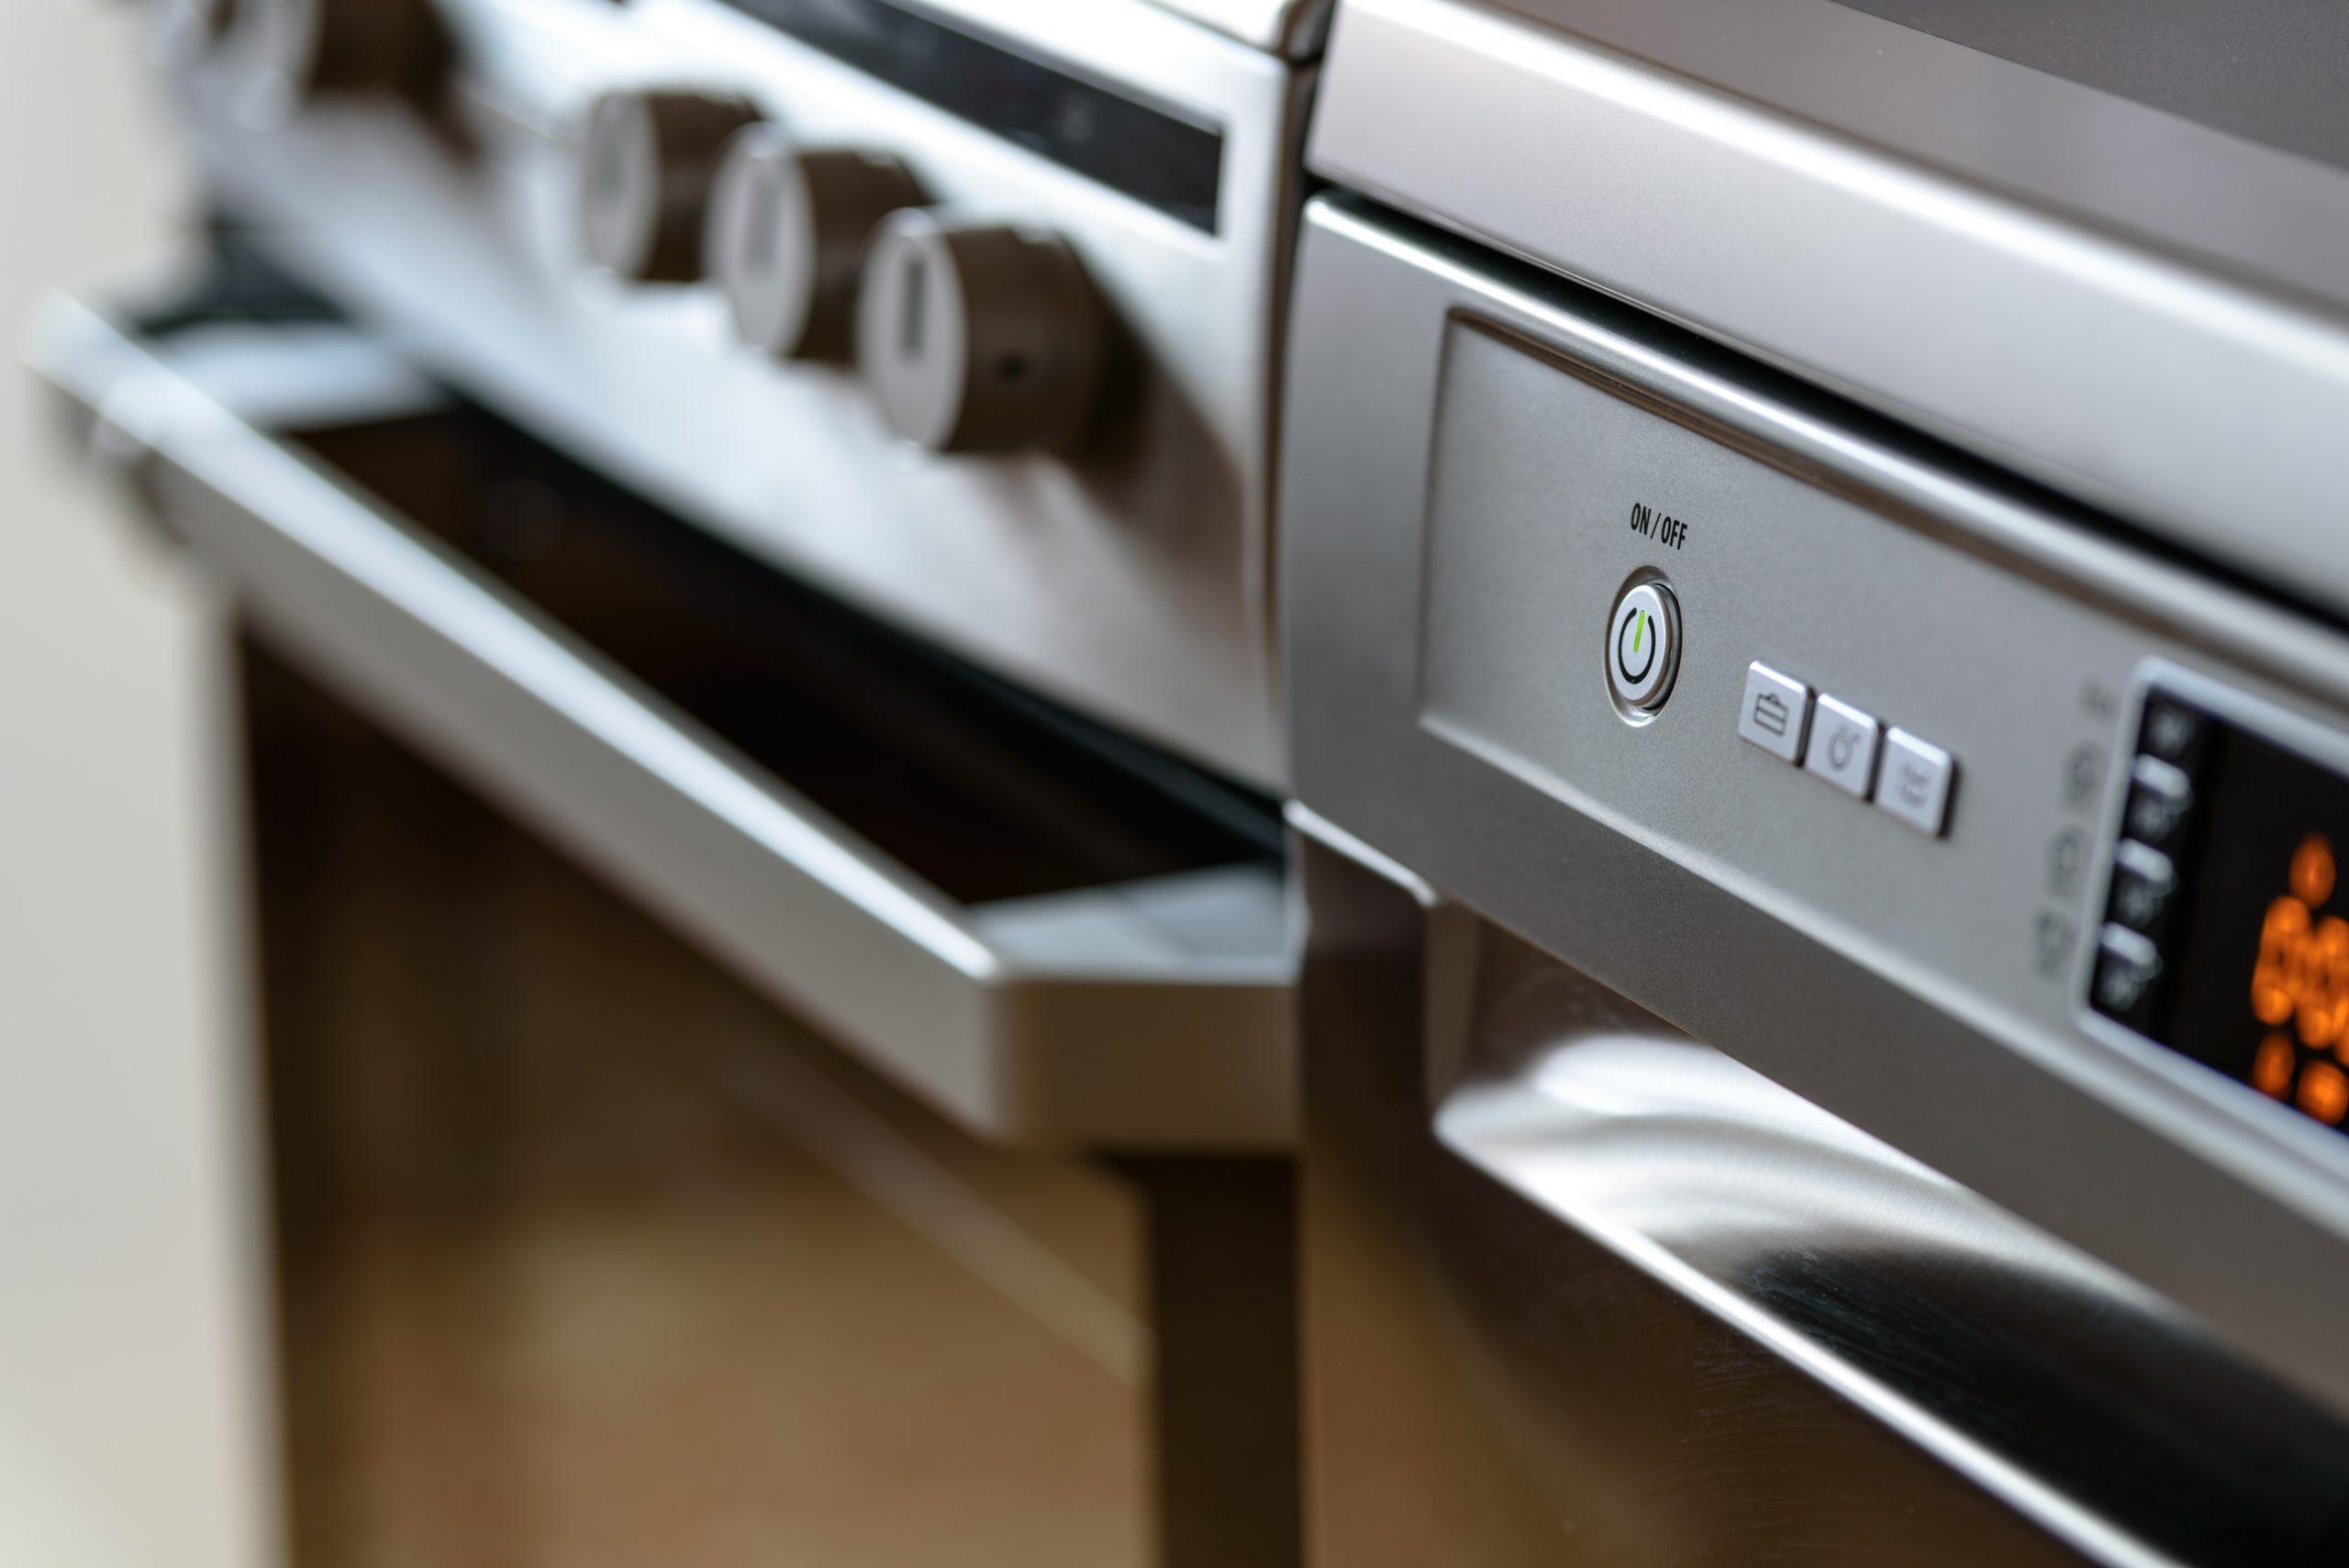 comfort-control-cooking-data-213162